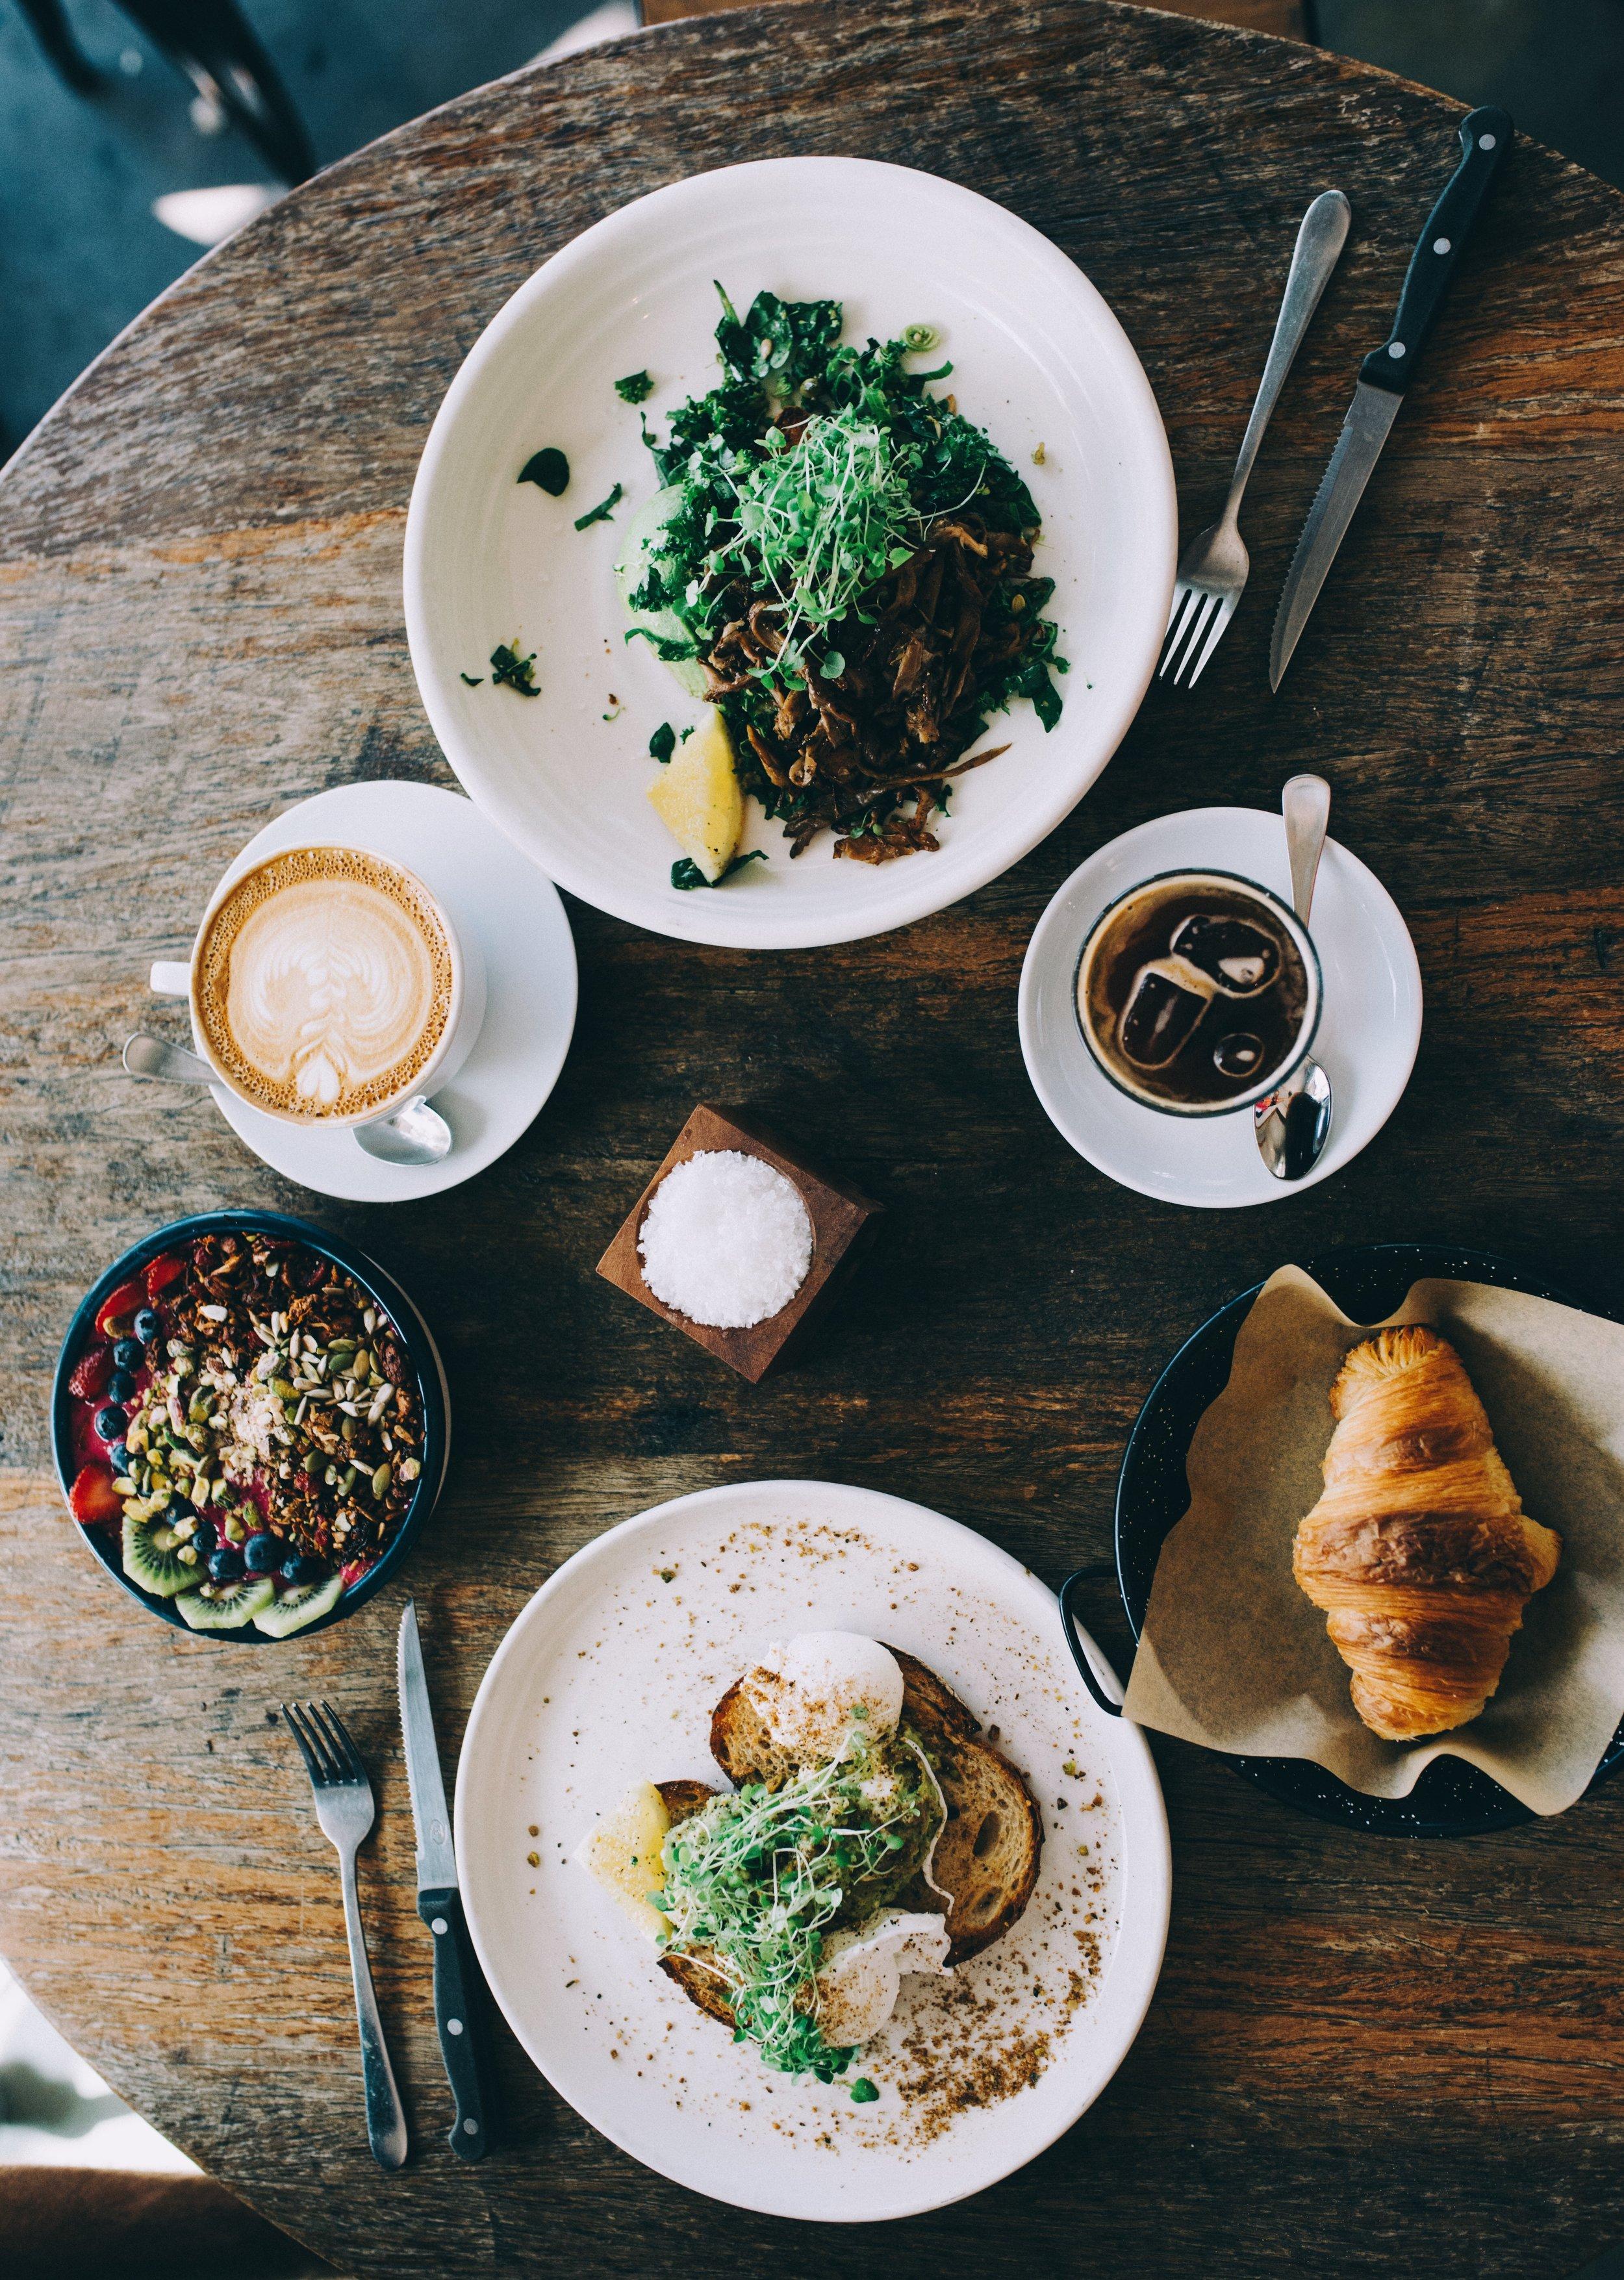 Sunday brunch spread at Black Board Coffee